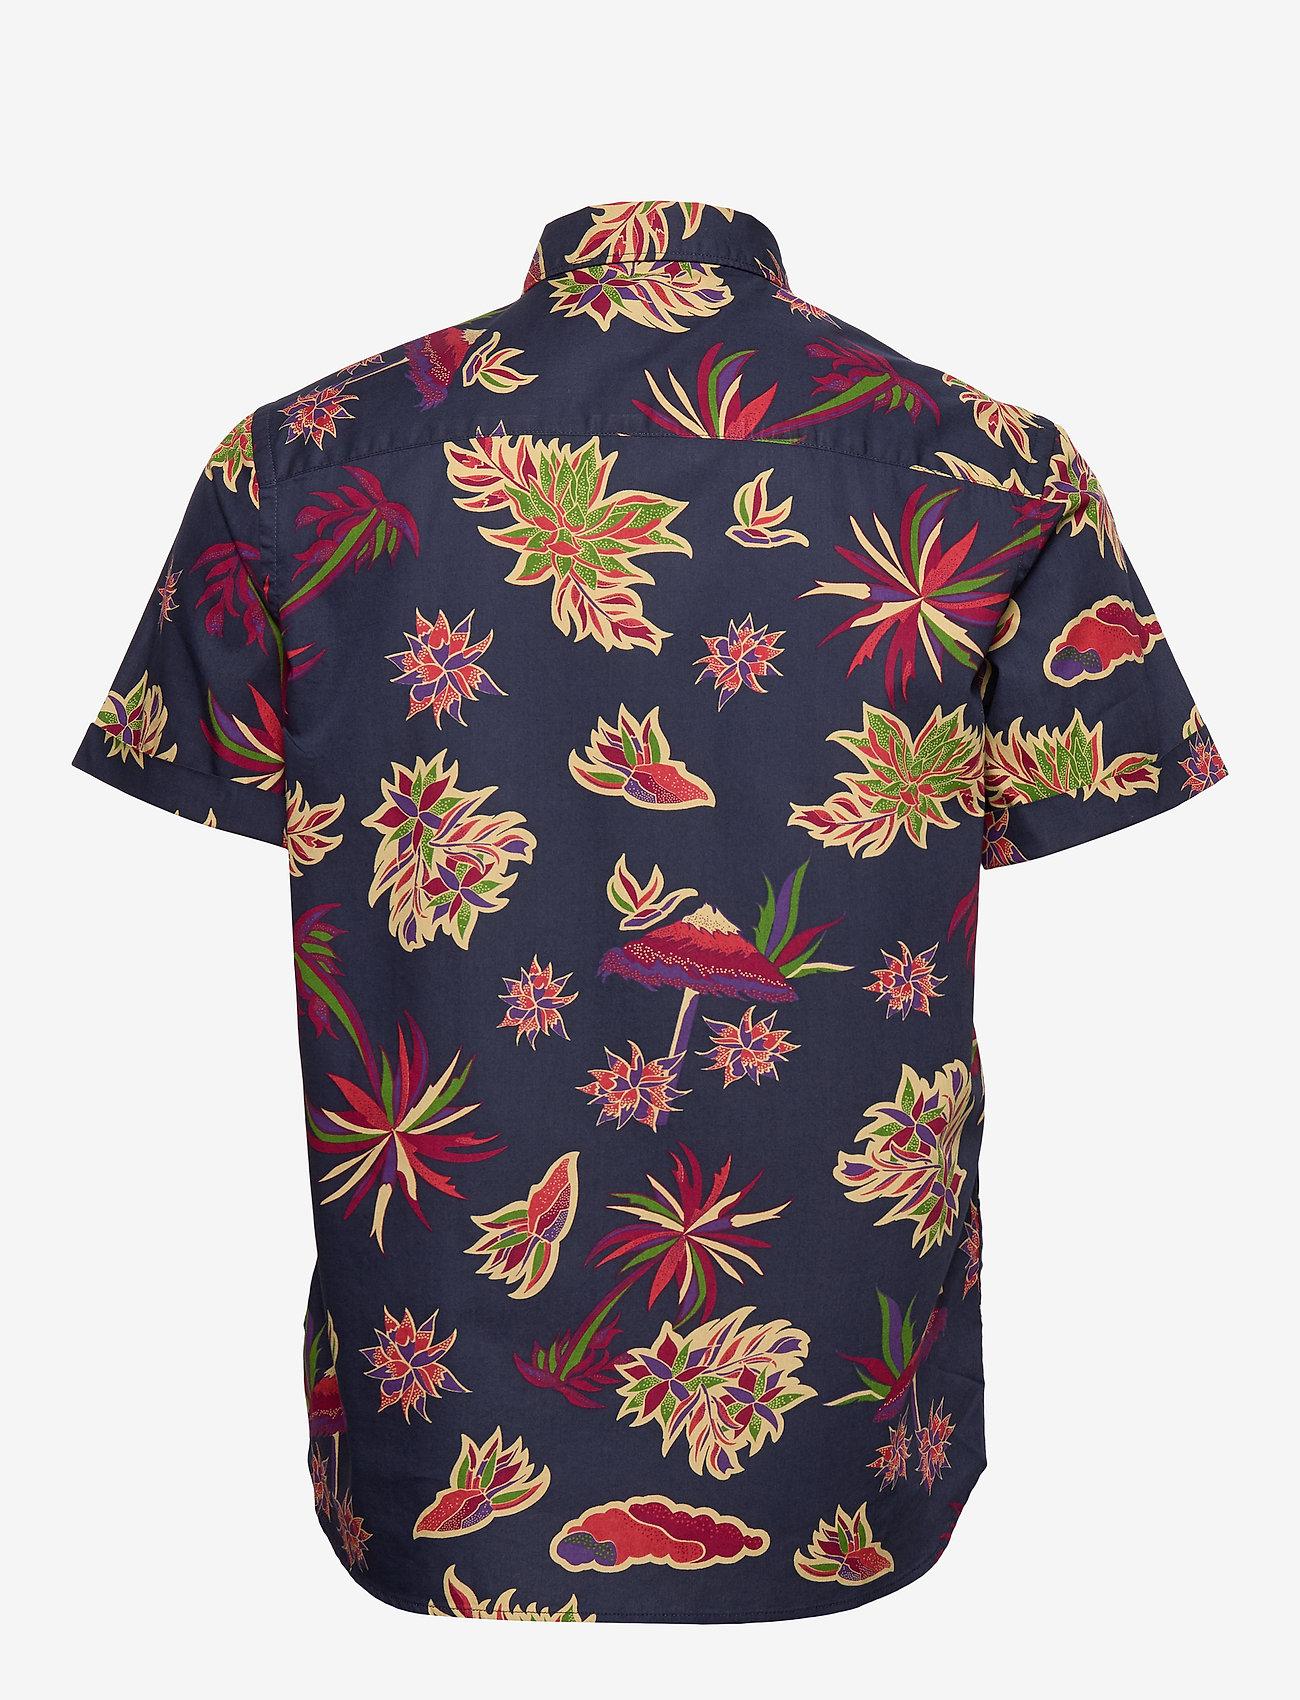 Scotch & Soda - REGULAR FIT- All-over printed shortsleeve shirt - short-sleeved shirts - combo h - 1